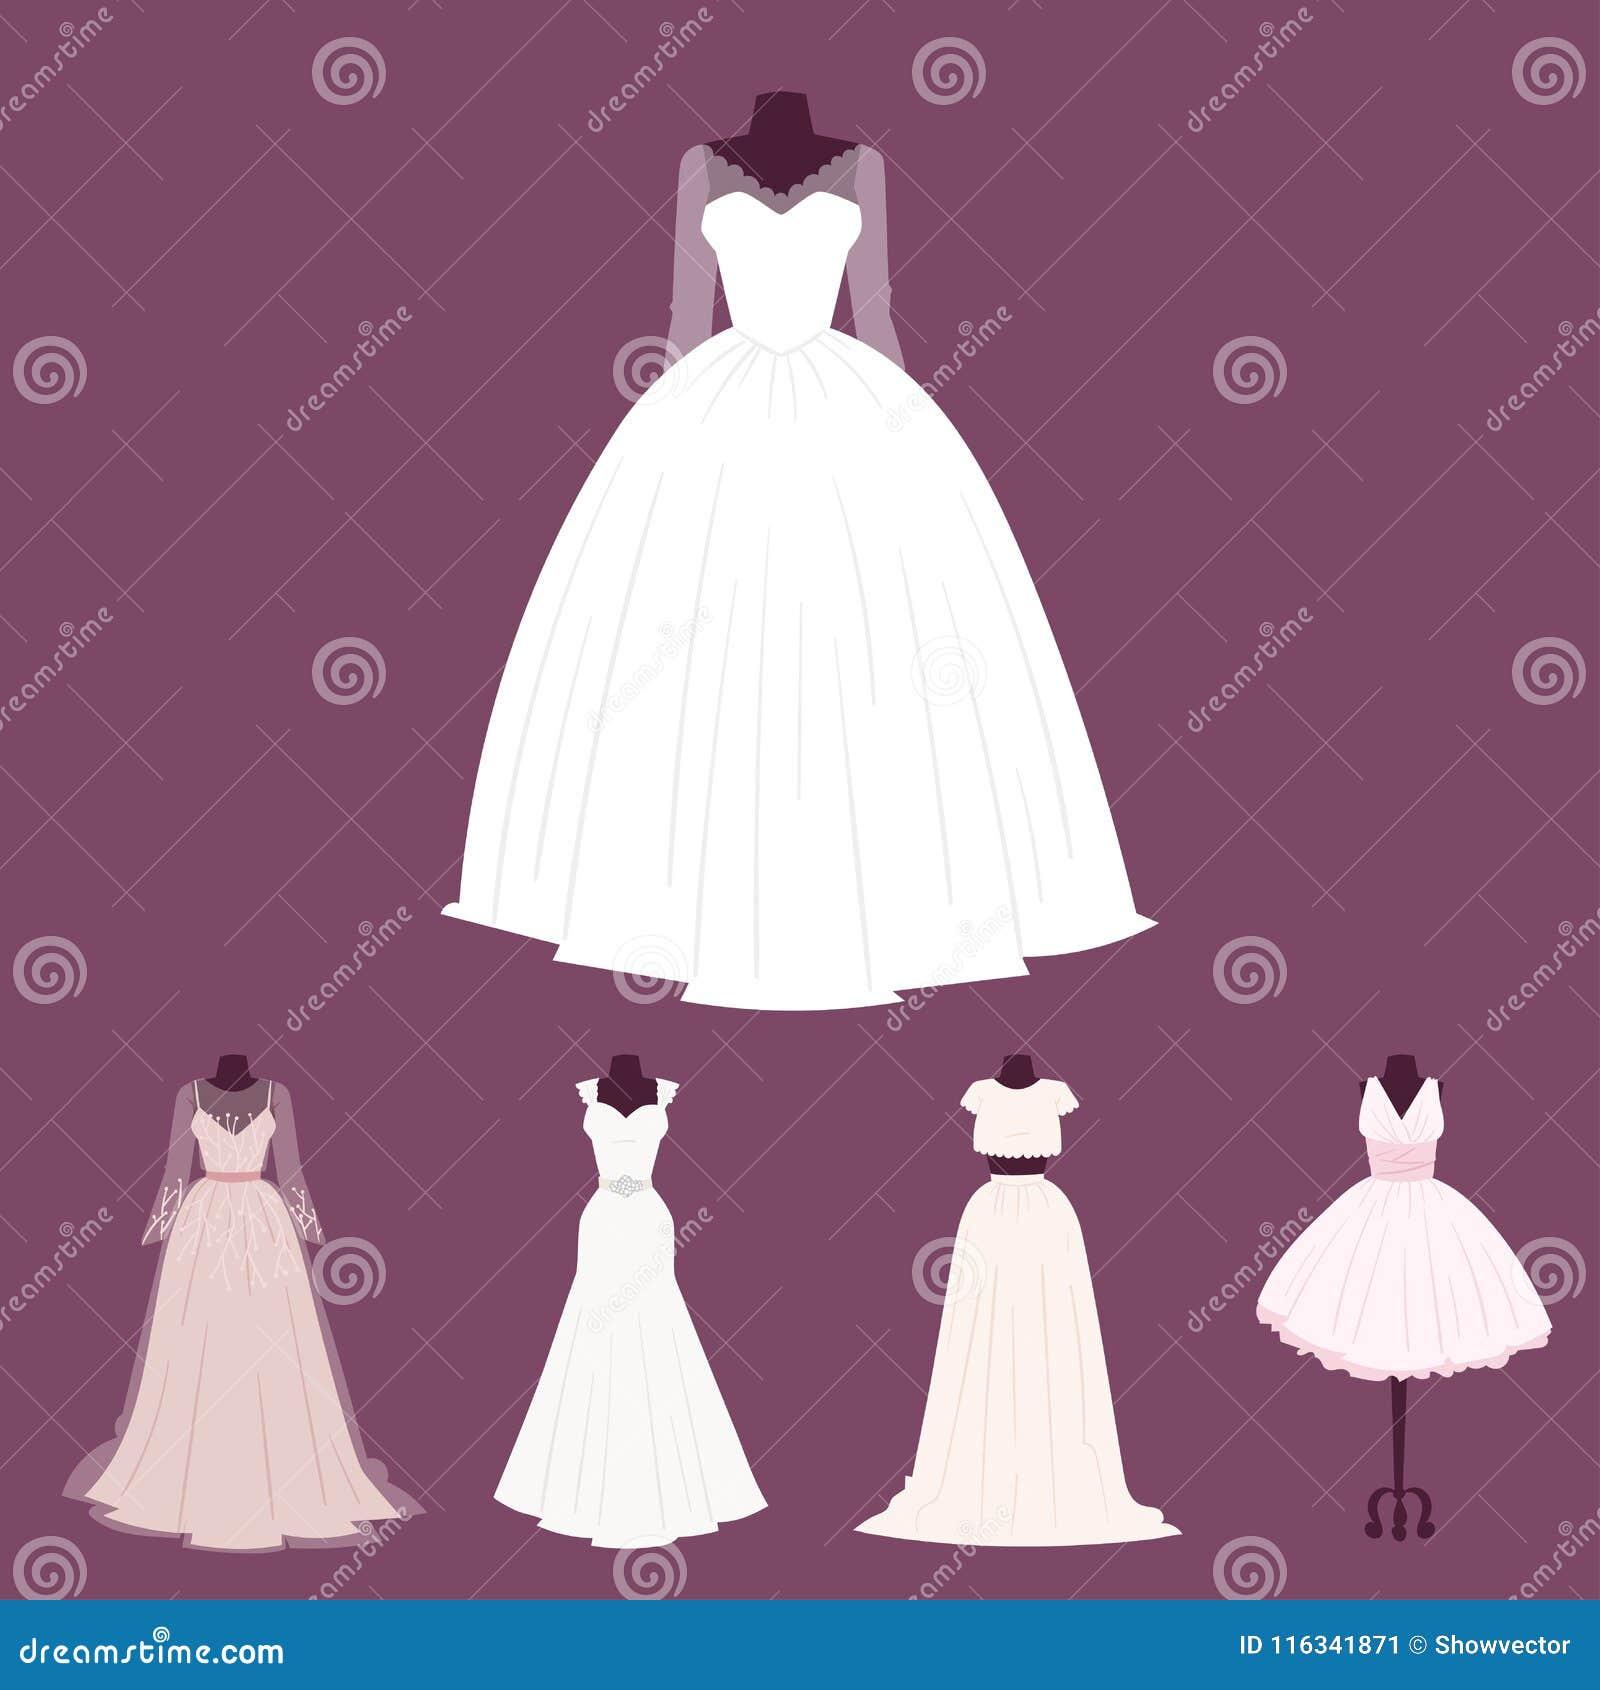 14aff94a857 Wedding bride dress elegance style celebration bridal shower clothing  accessories vector illustration.